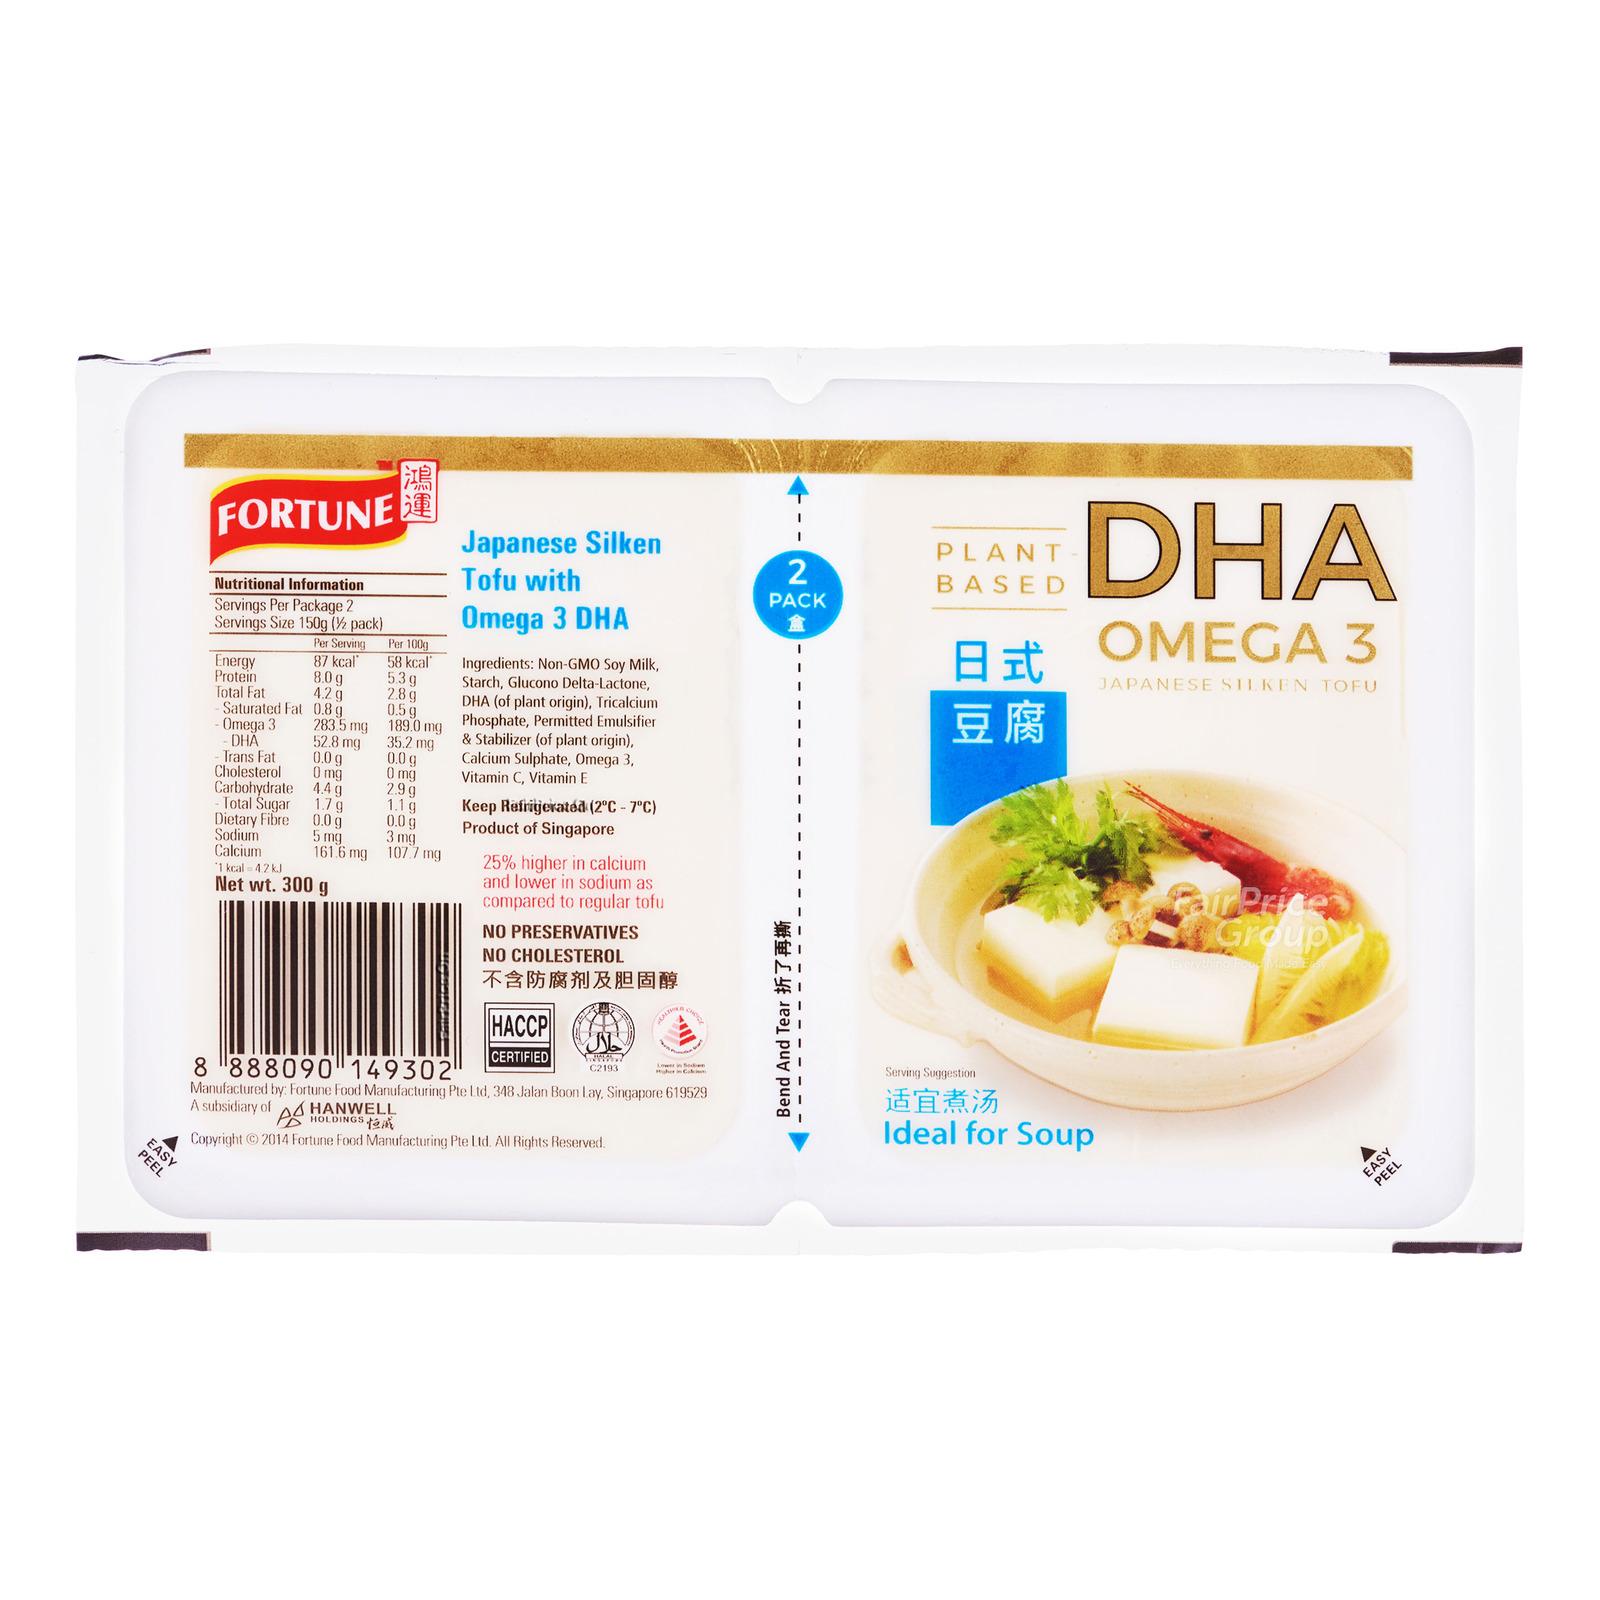 Fortune Japanese Silken Tofu - Omega 3 DHA